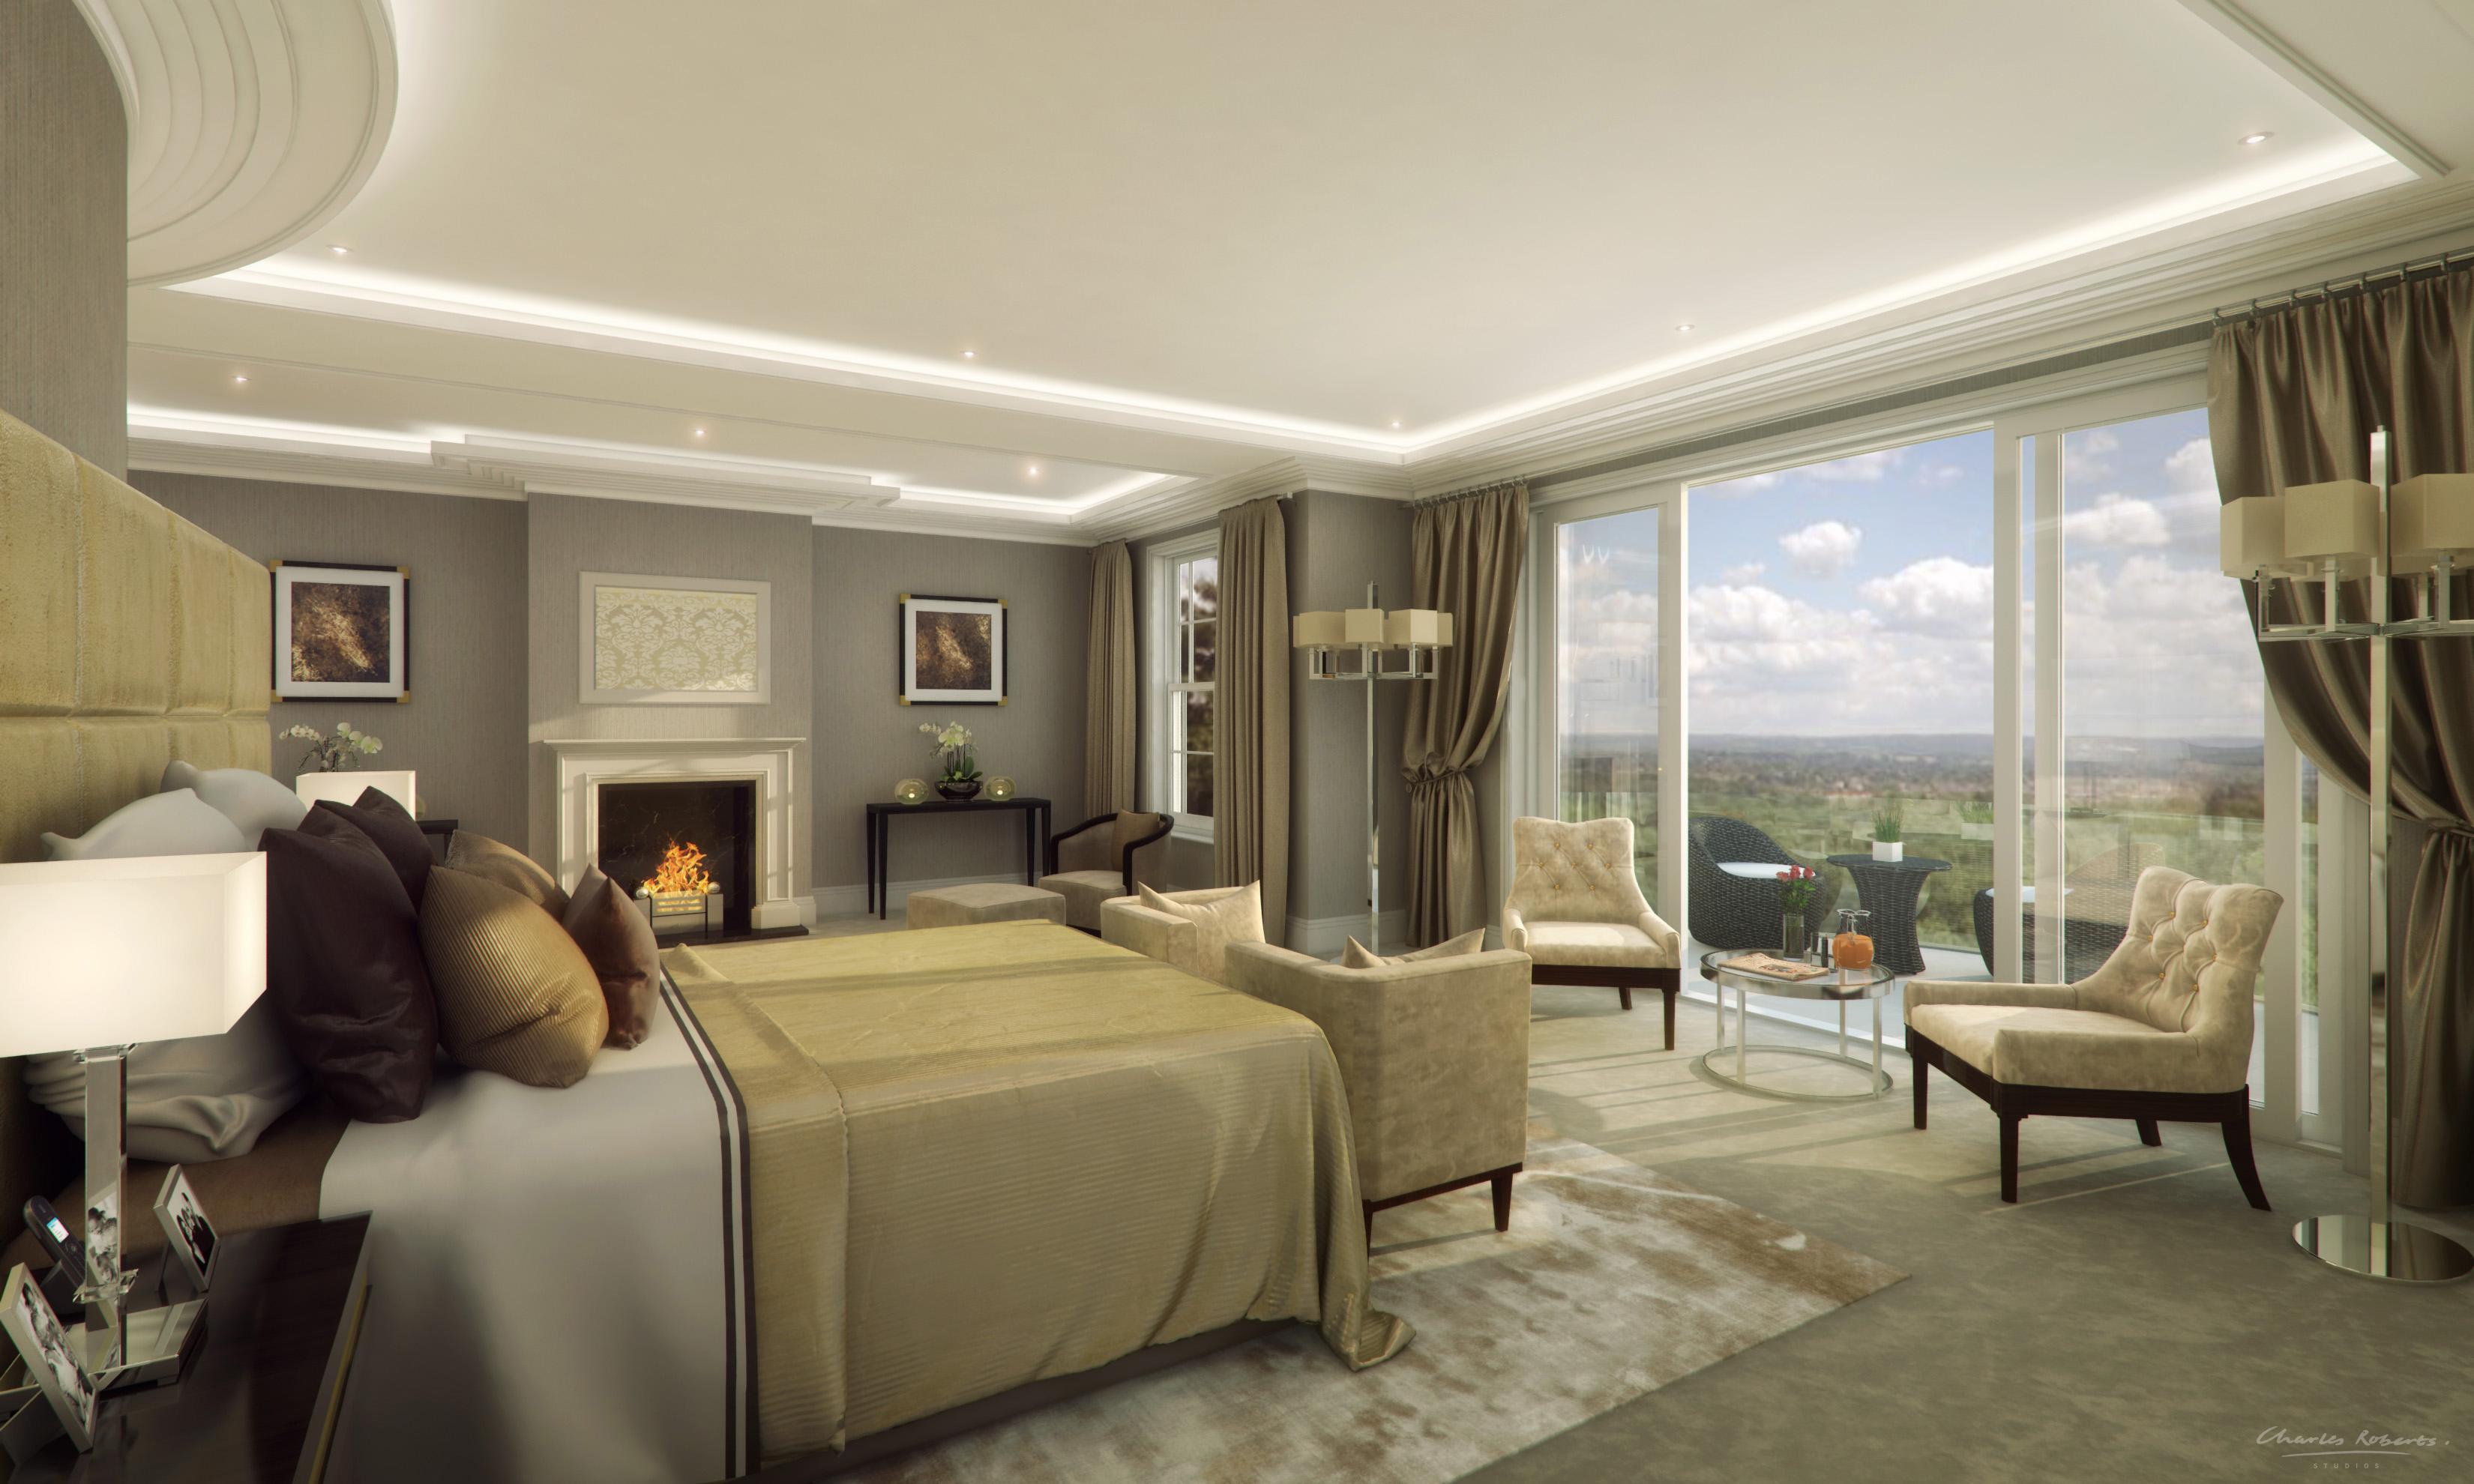 2817-HR-Master-bedroom